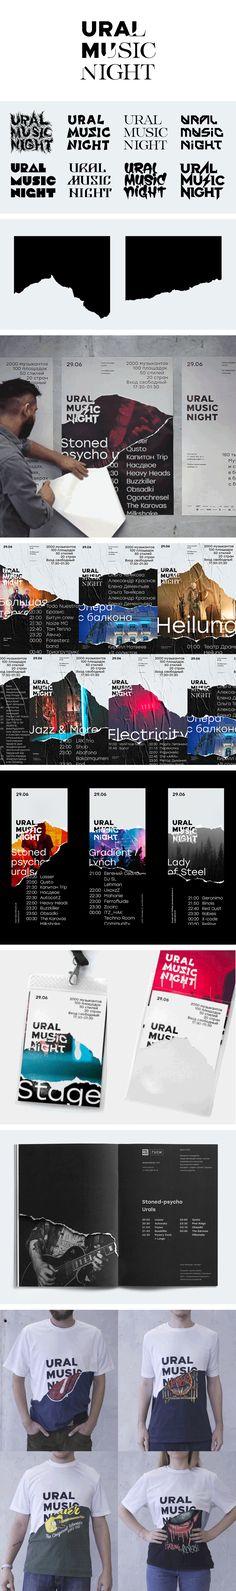 Corporate Design for Ural Music Night-Corporate Design for Ural Music Night - Id Design, Flyer Design, Logo Design, Graphic Design, Identity Design, Visual Identity, Brand Identity, Book Design Layout, Corporate Design